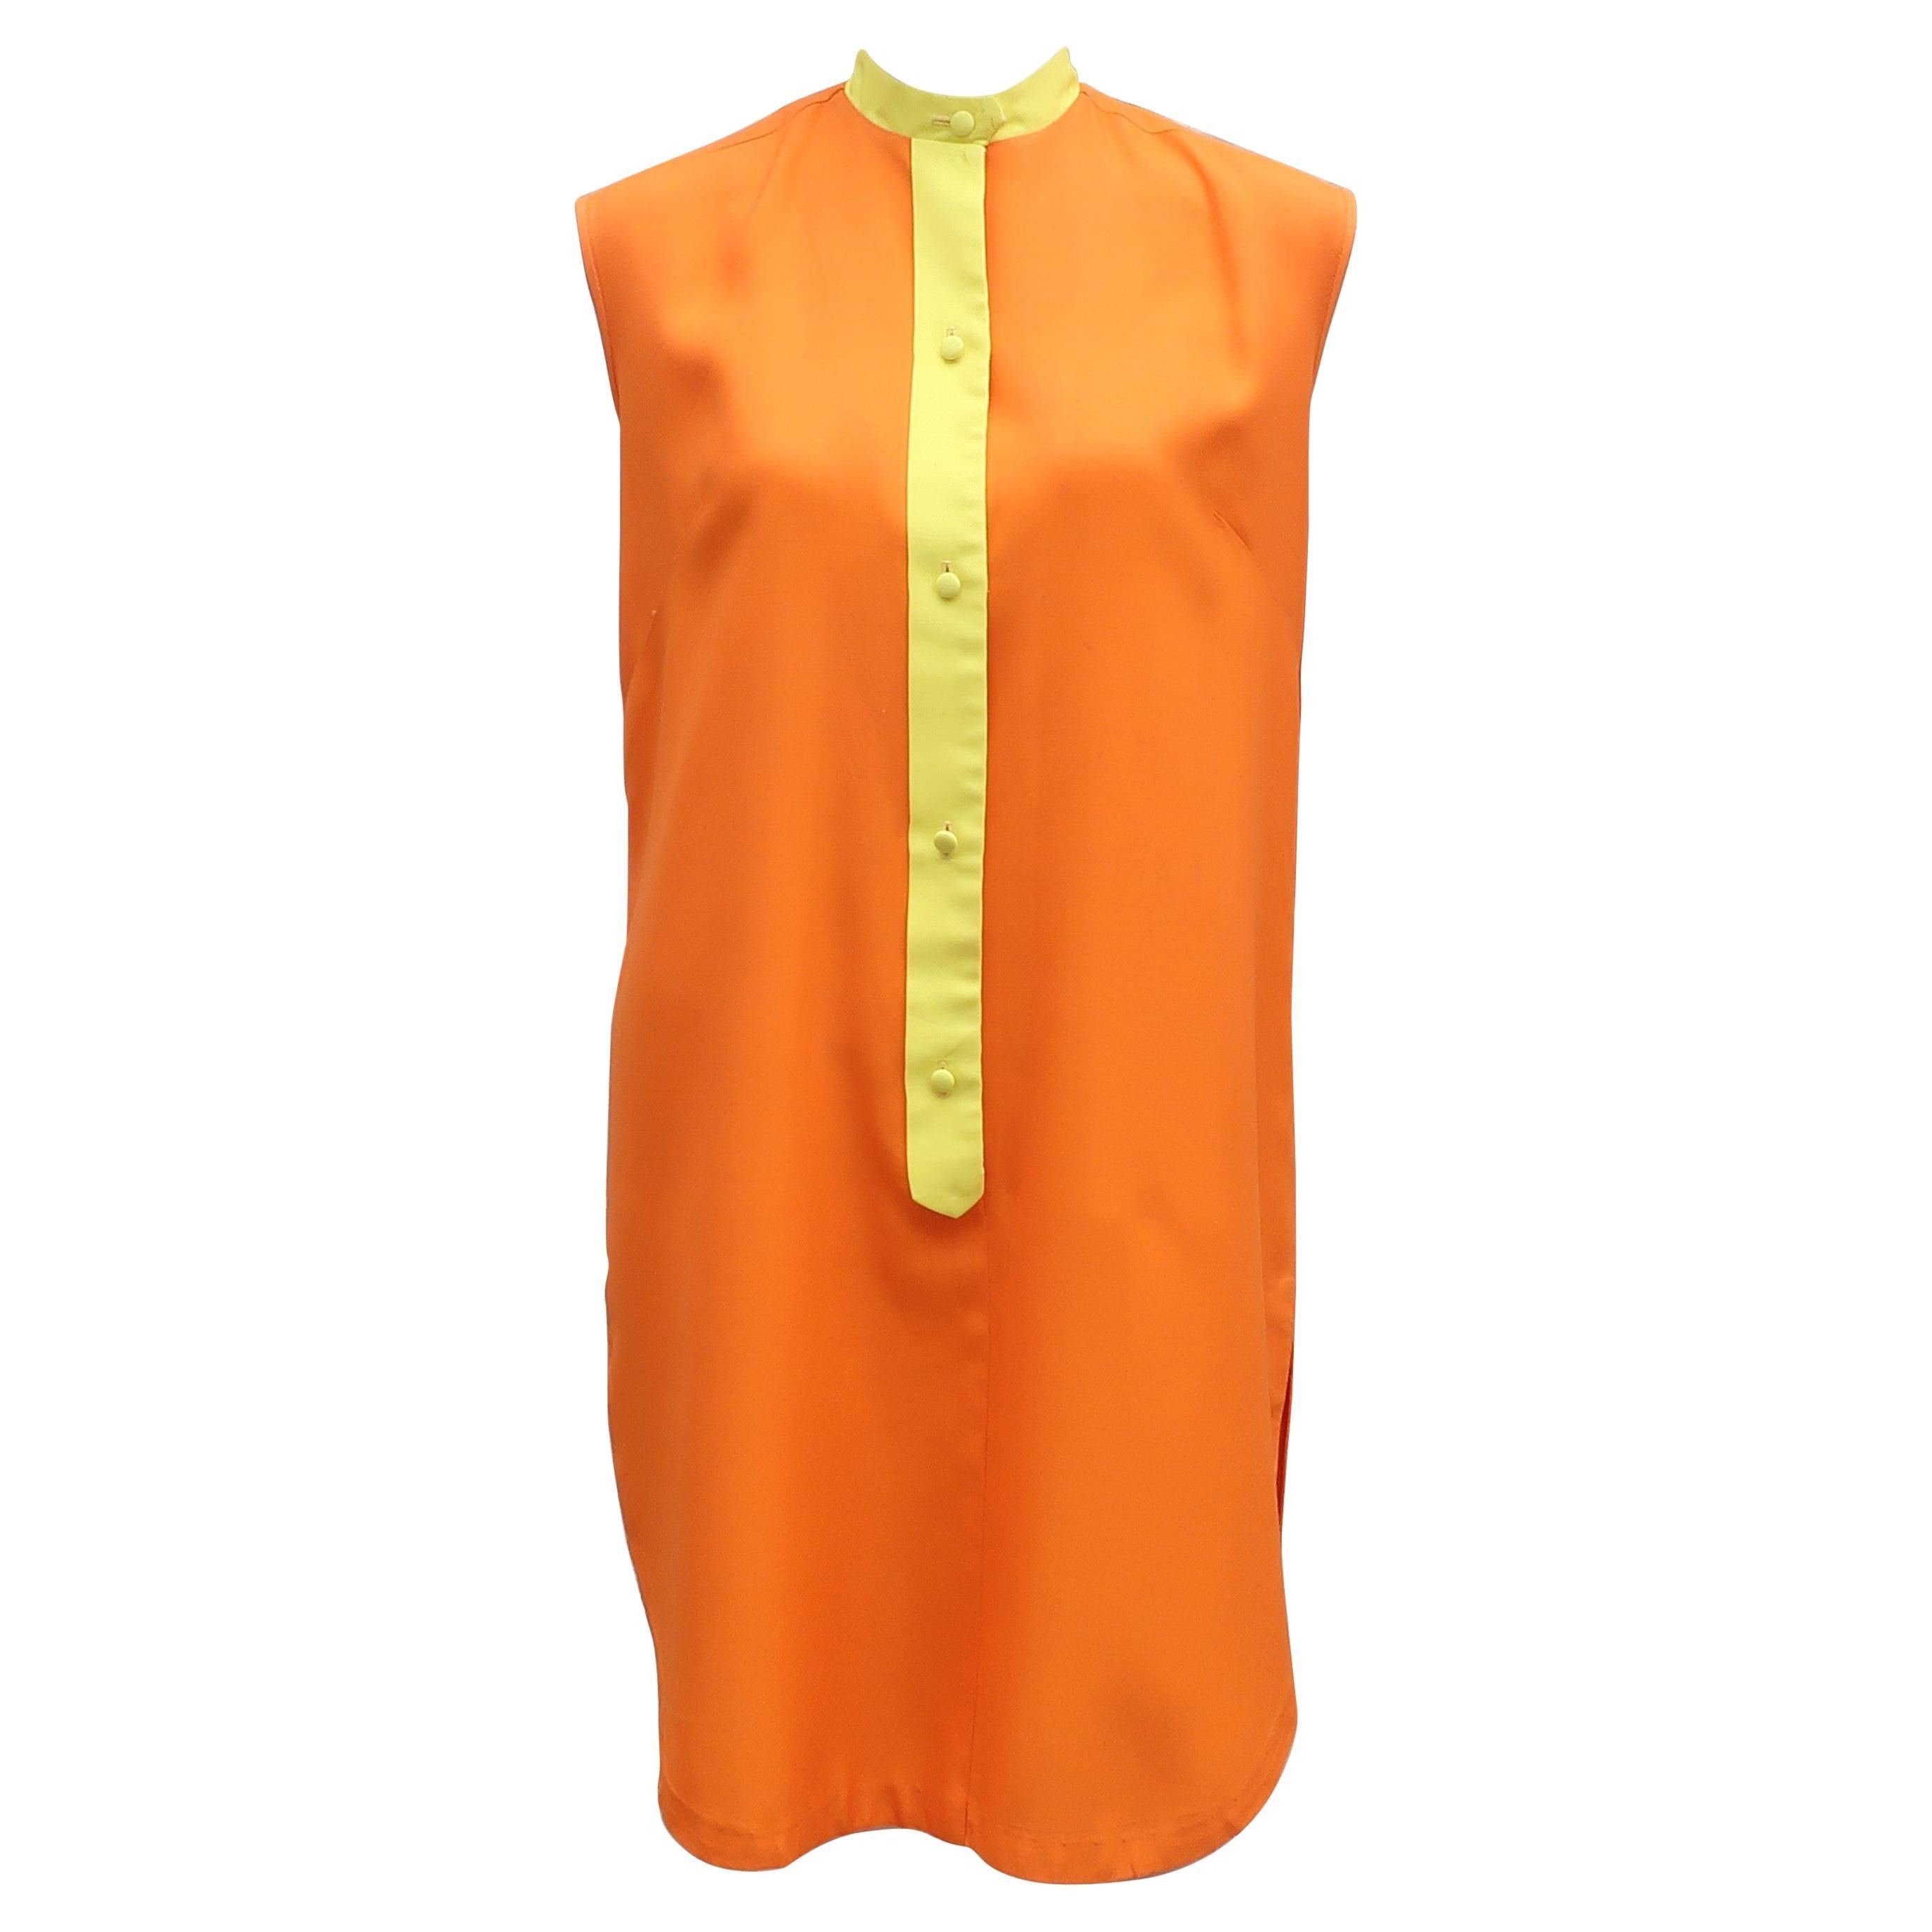 Saks Fifth Avenue Orange & Yellow Cotton Blend Shift Dress, 1960's